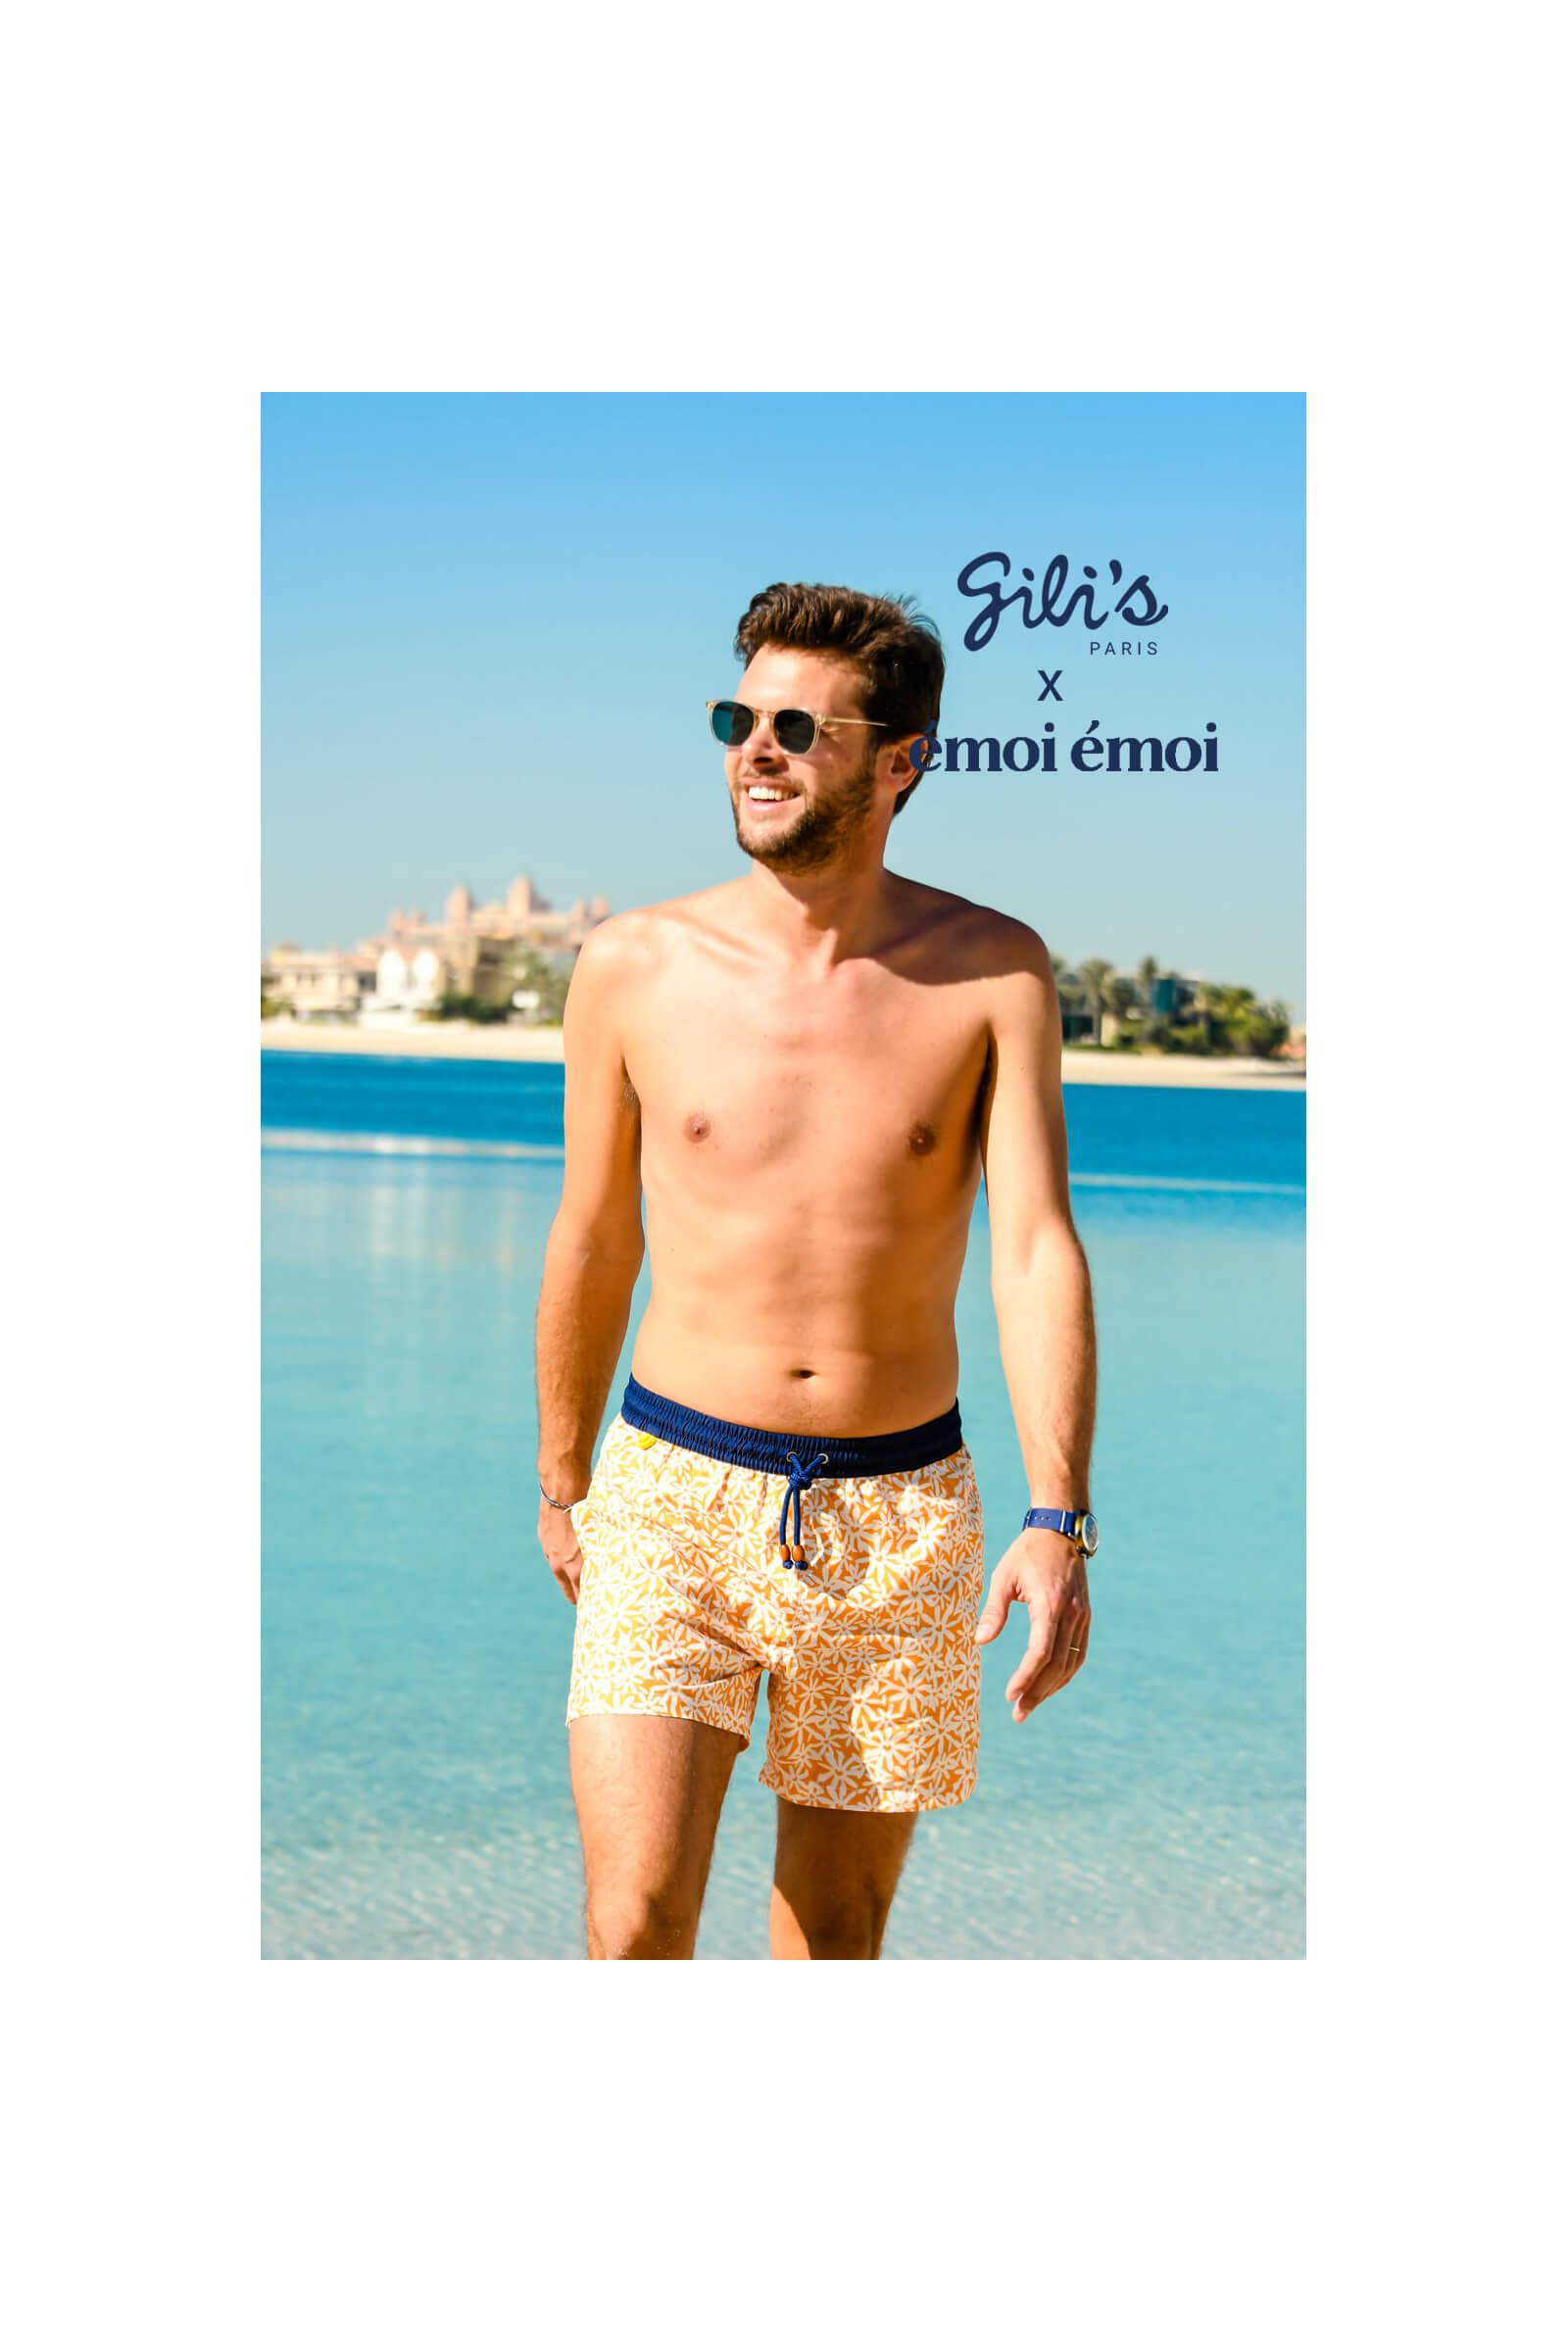 Man wearing a Pâquerettes GILI'S x EMOI EMOI swimsuit with elasticated belt